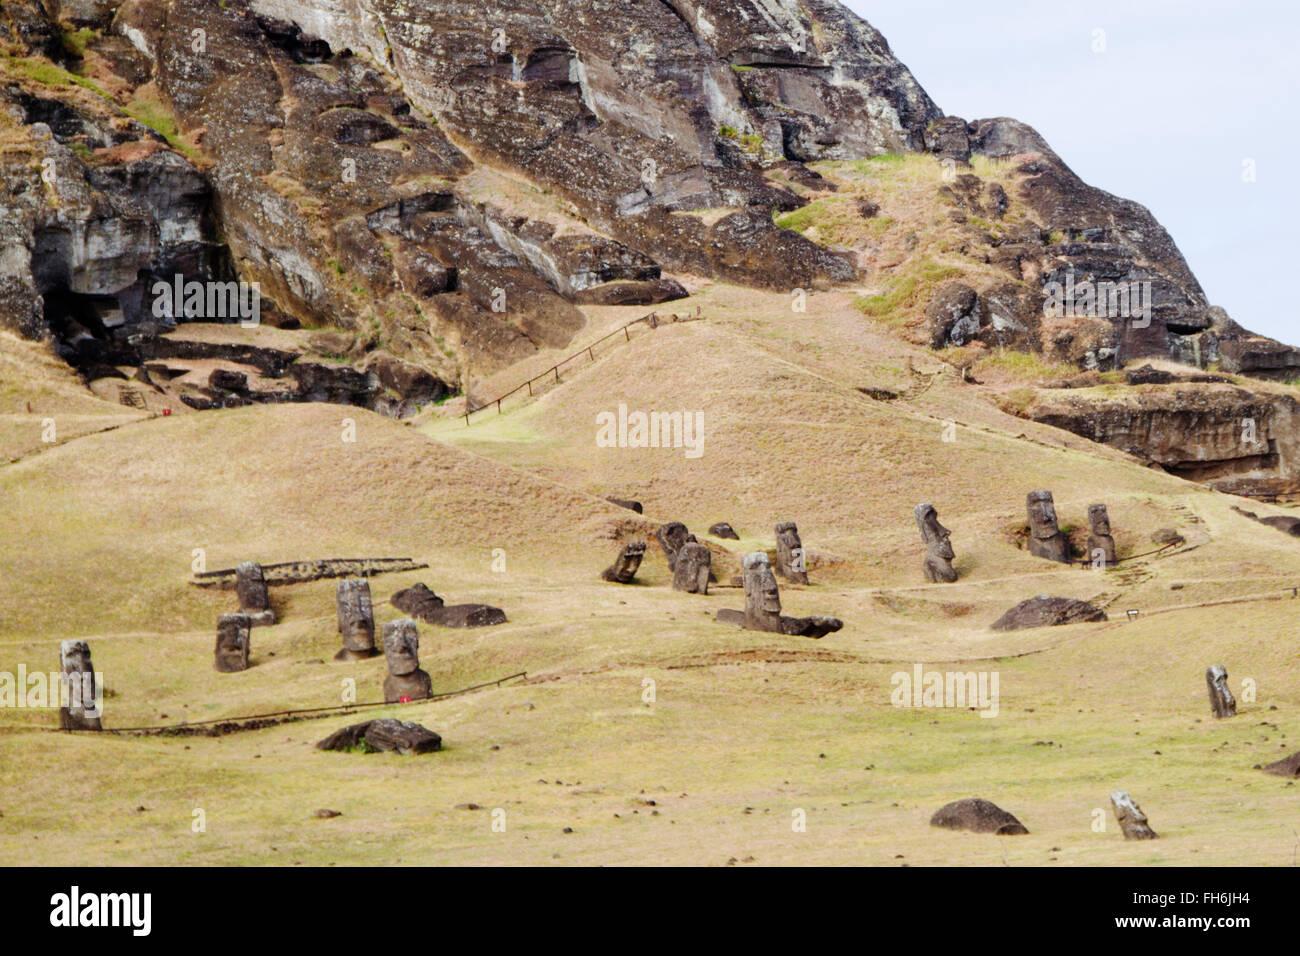 Statues (moai) at Rano Raraku Easter Island, Chile - Stock Image